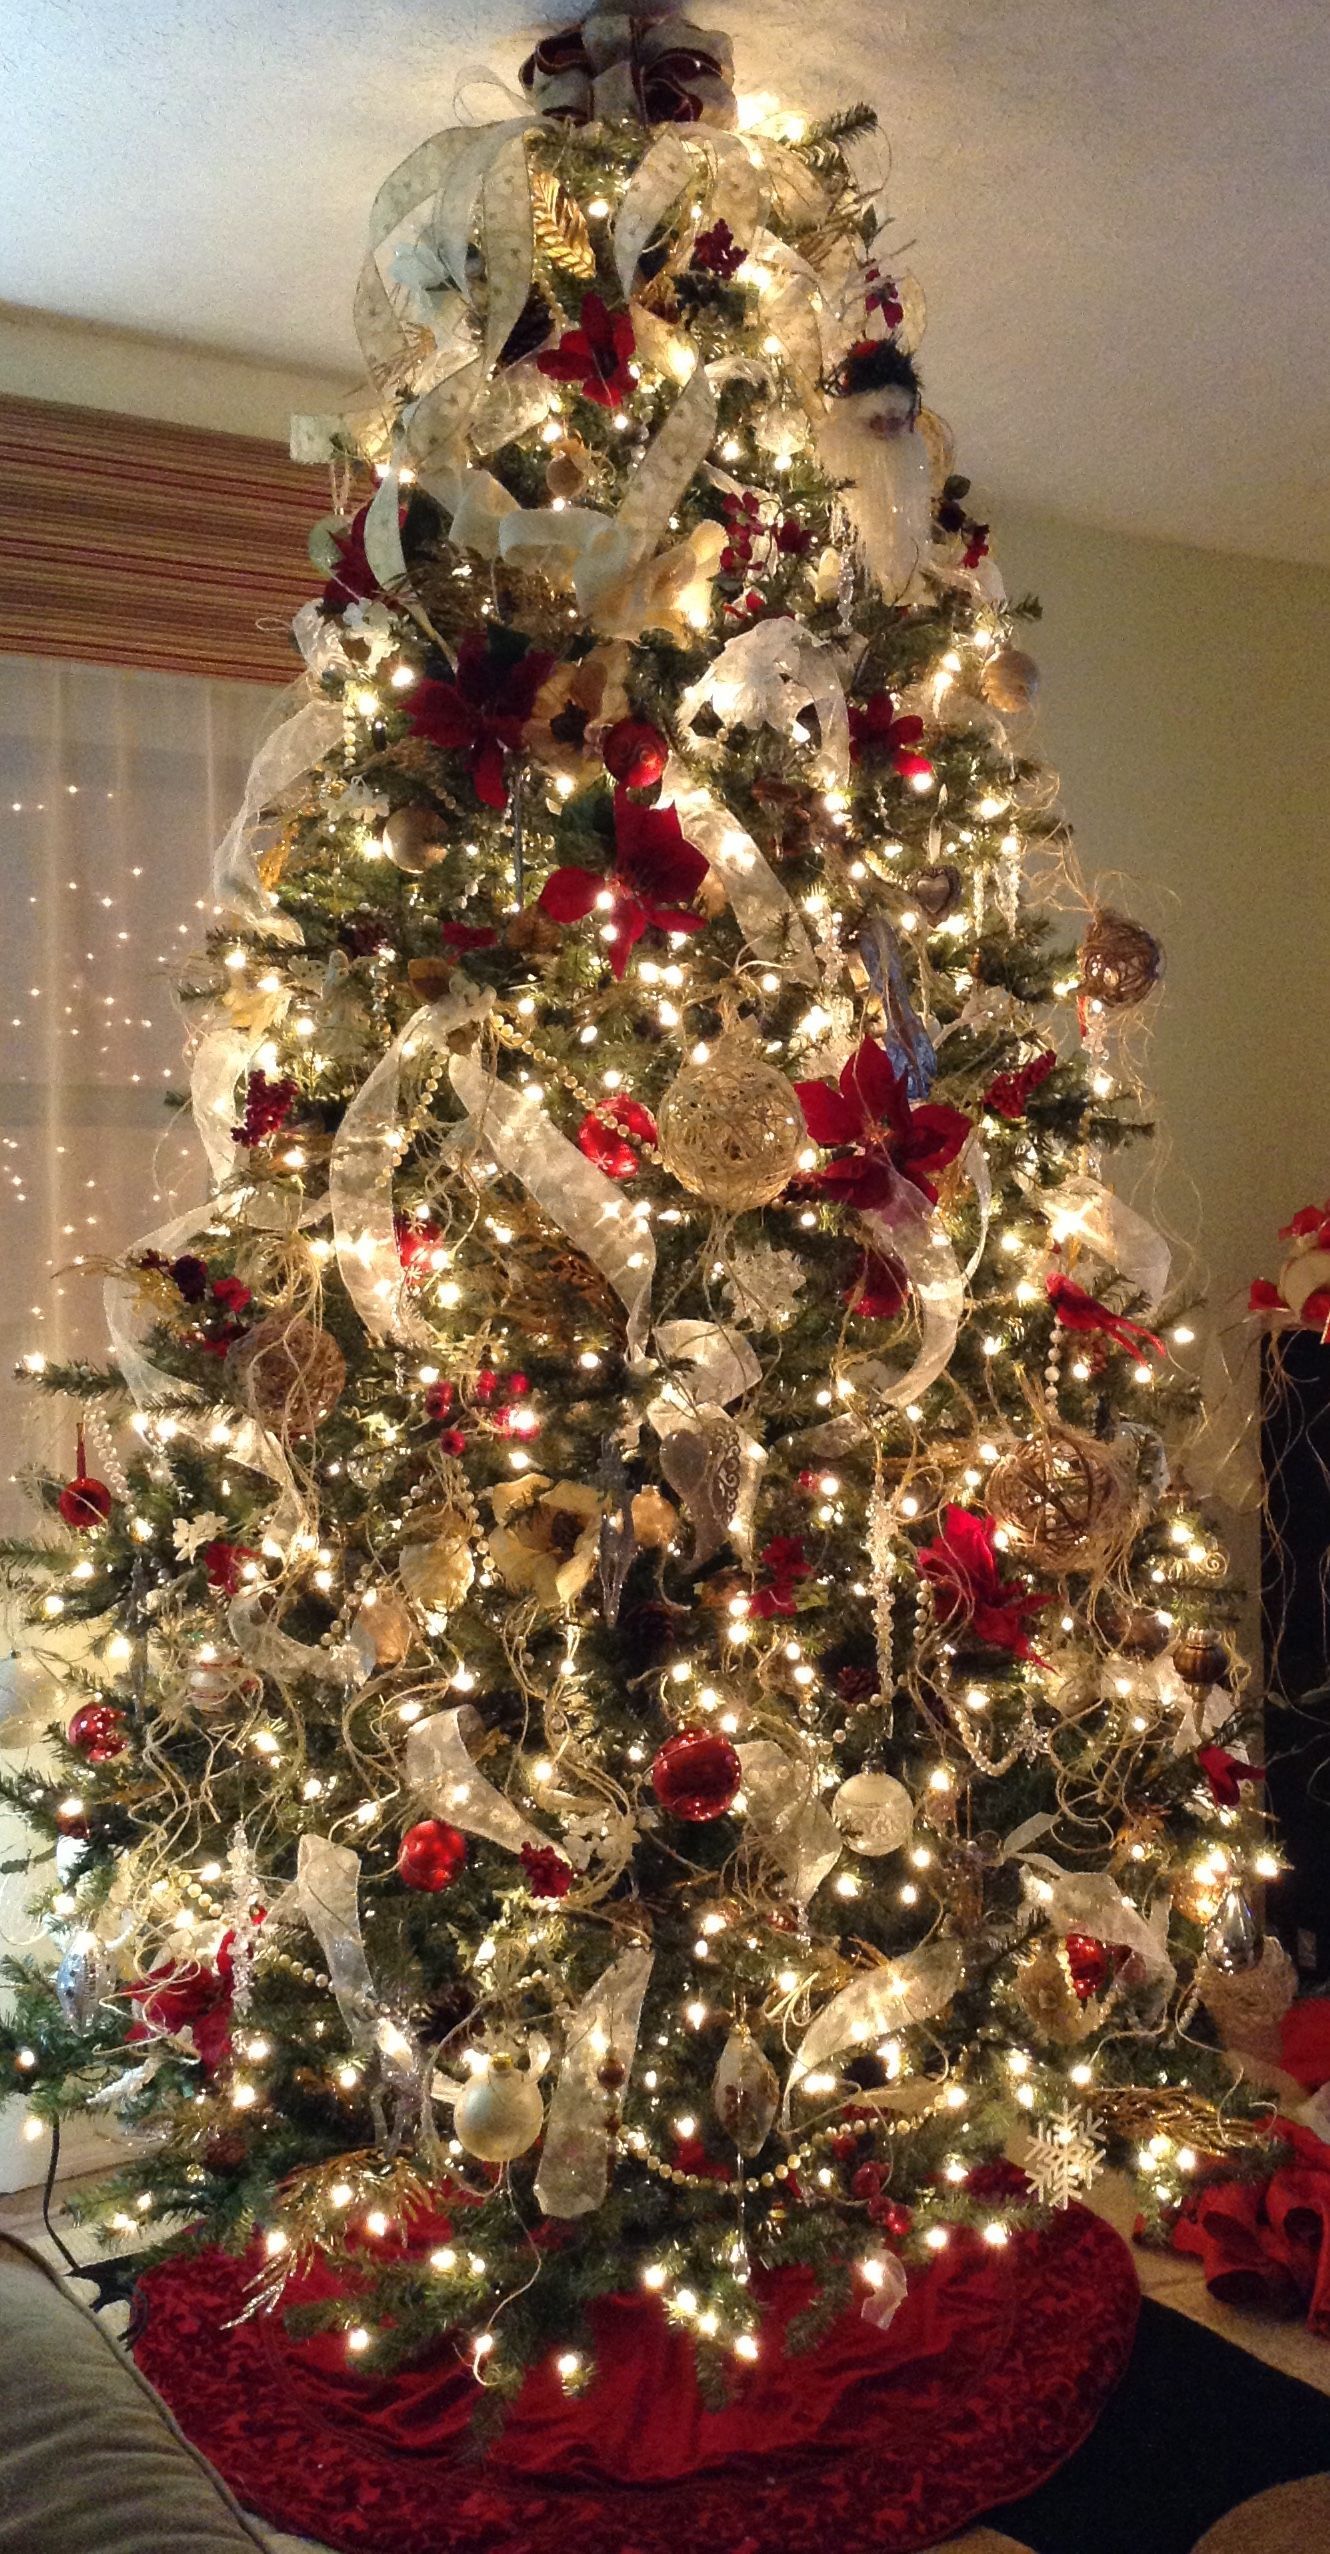 My Christmas Tree 2014 I Made The Jute Ornaments Burlap Garland